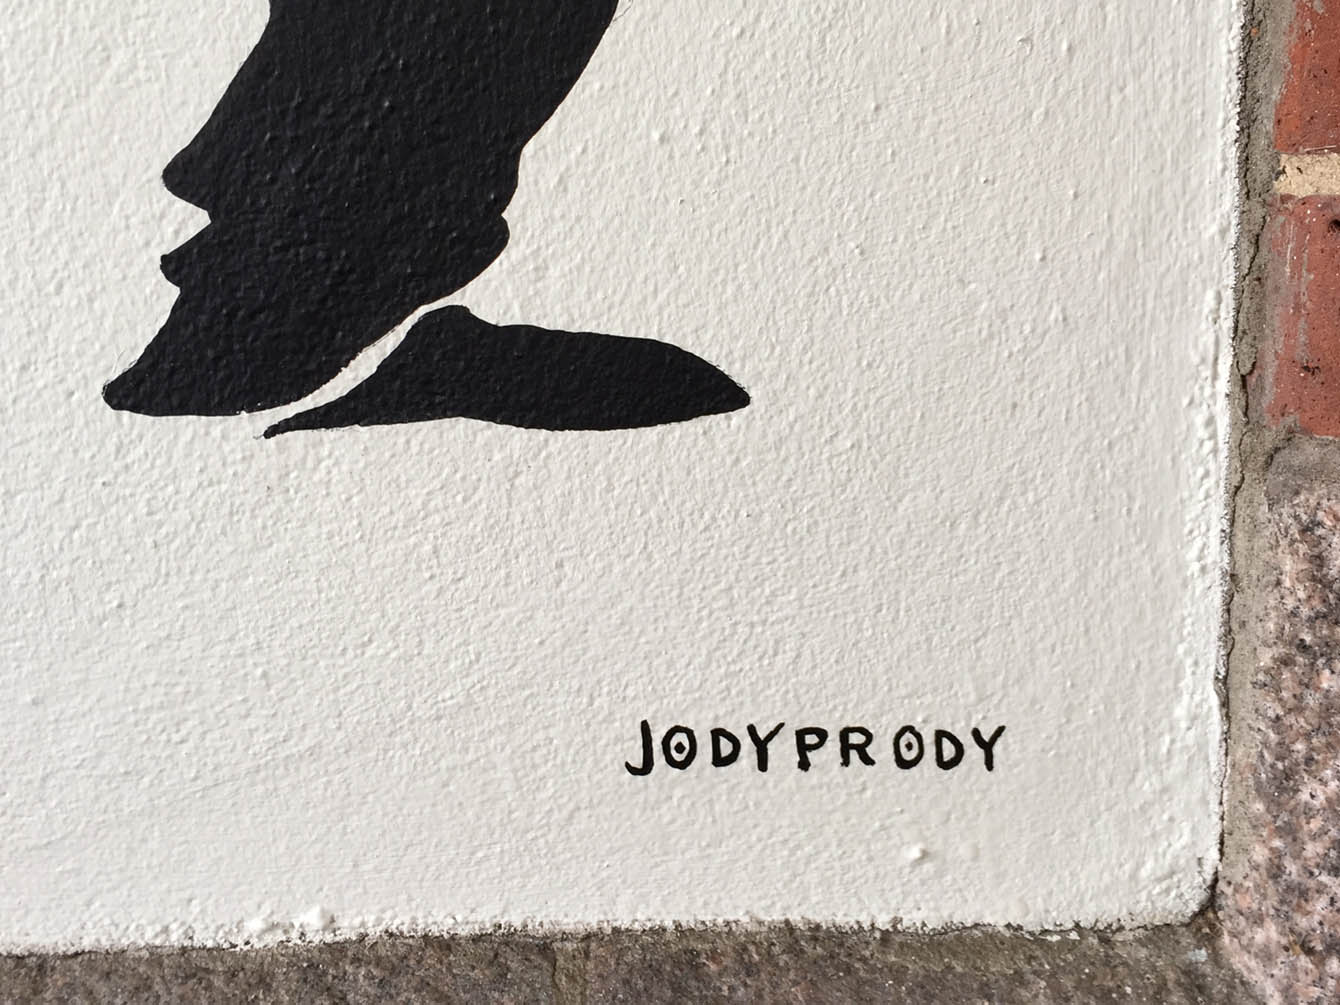 jodyprody_loge_finished_003